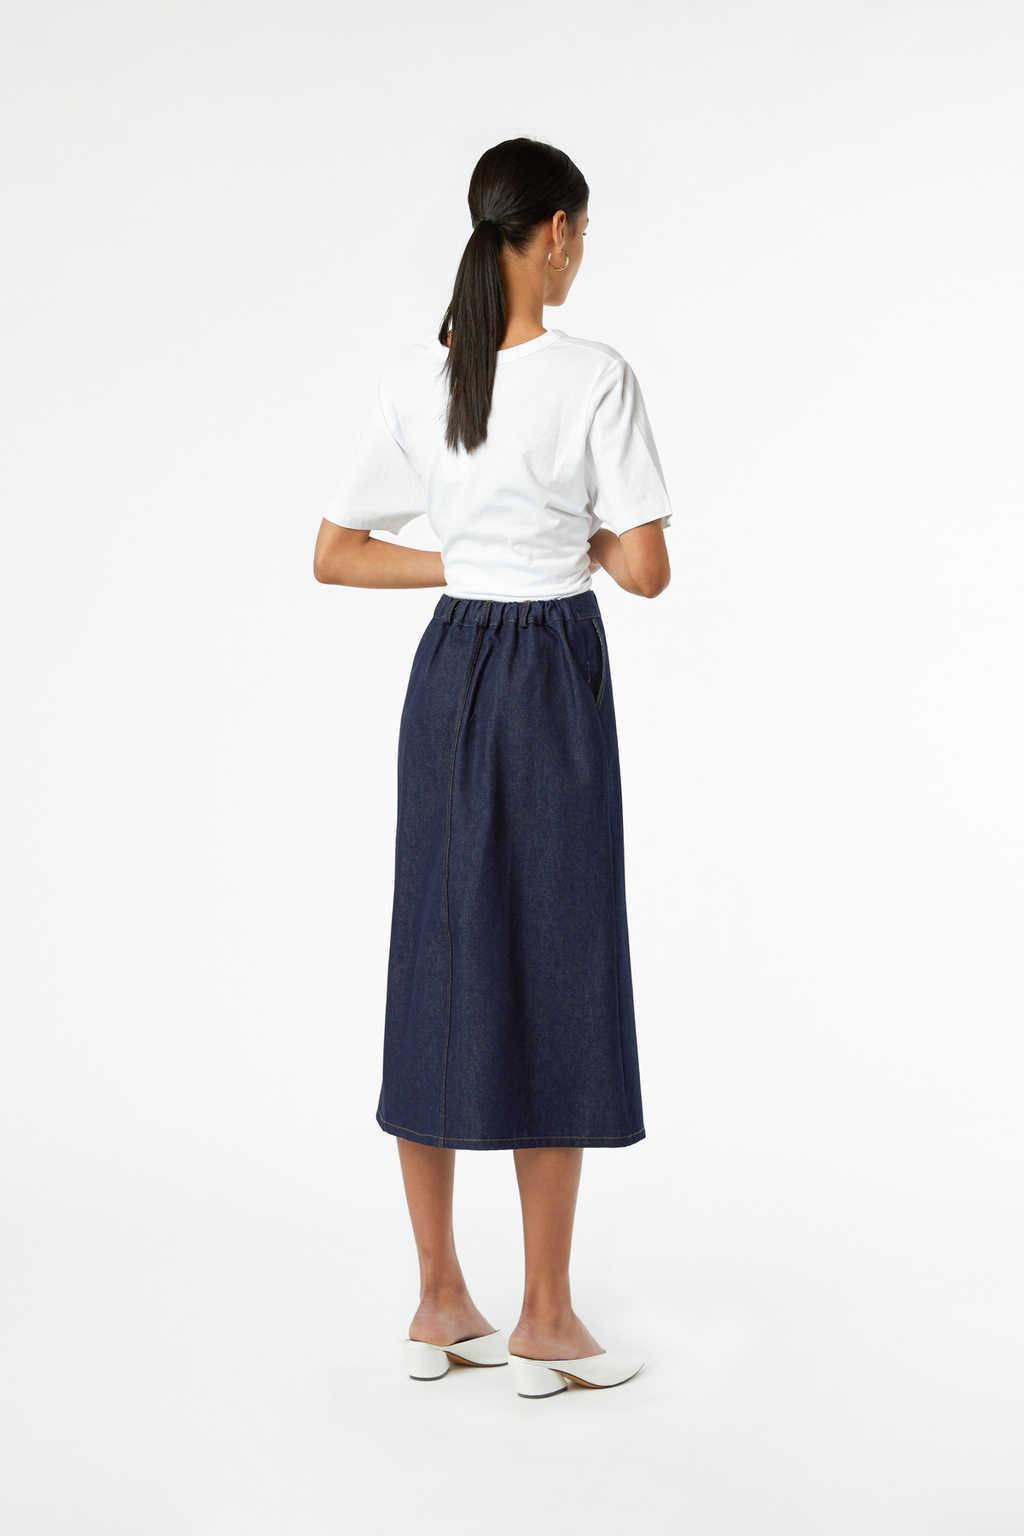 Skirt J010 Indigo 4